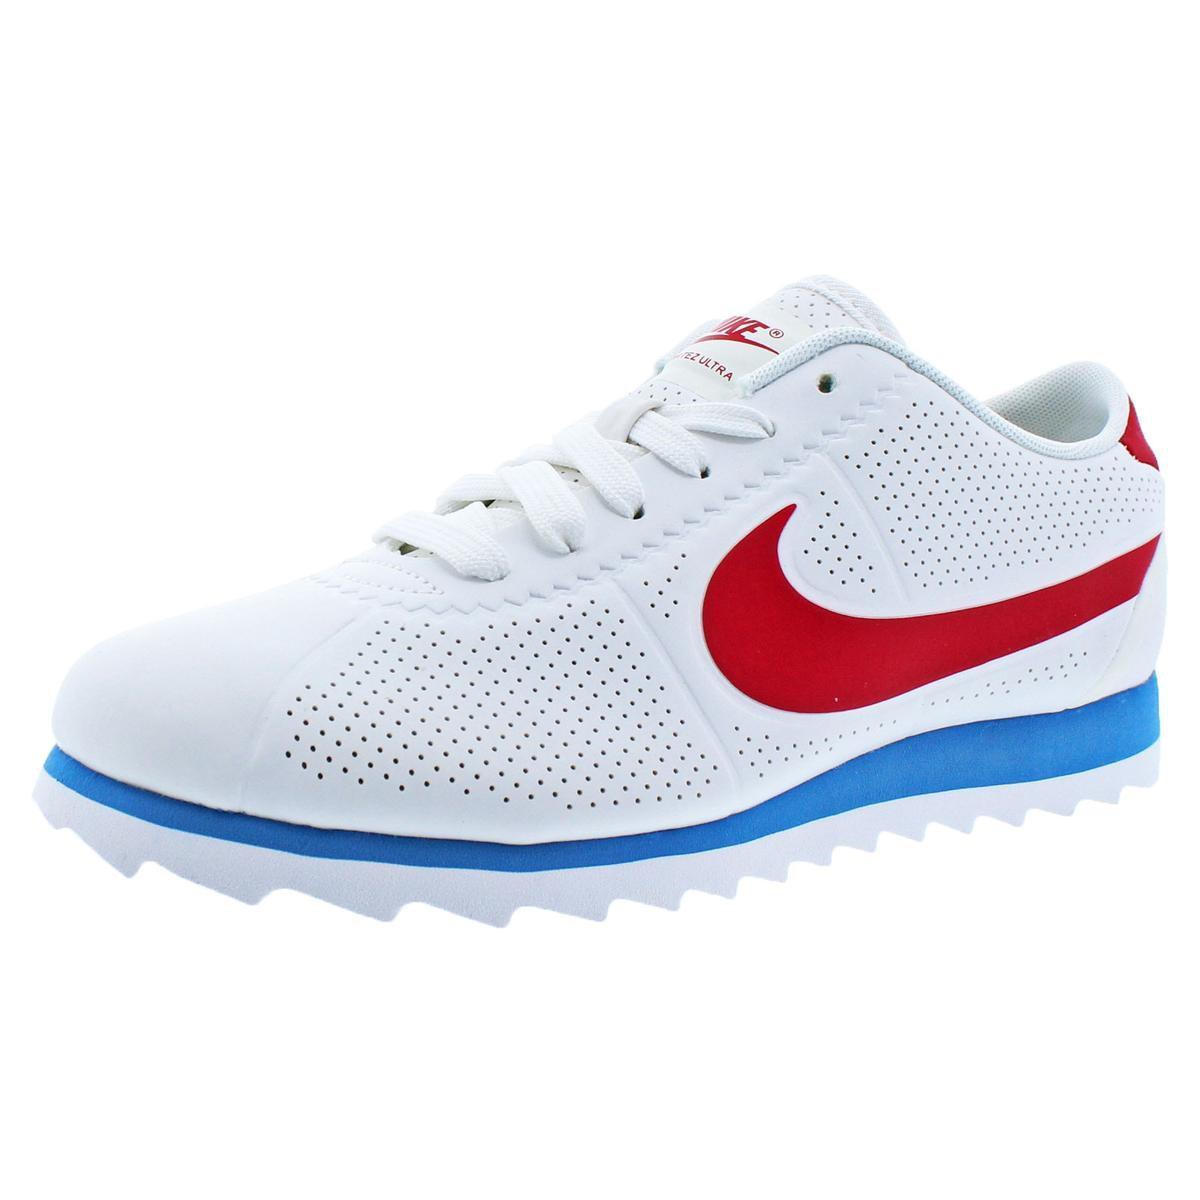 bd44d3e243f Lyst - Nike Cortez Ultra Moire Fashion Lowtop Sneakers in White